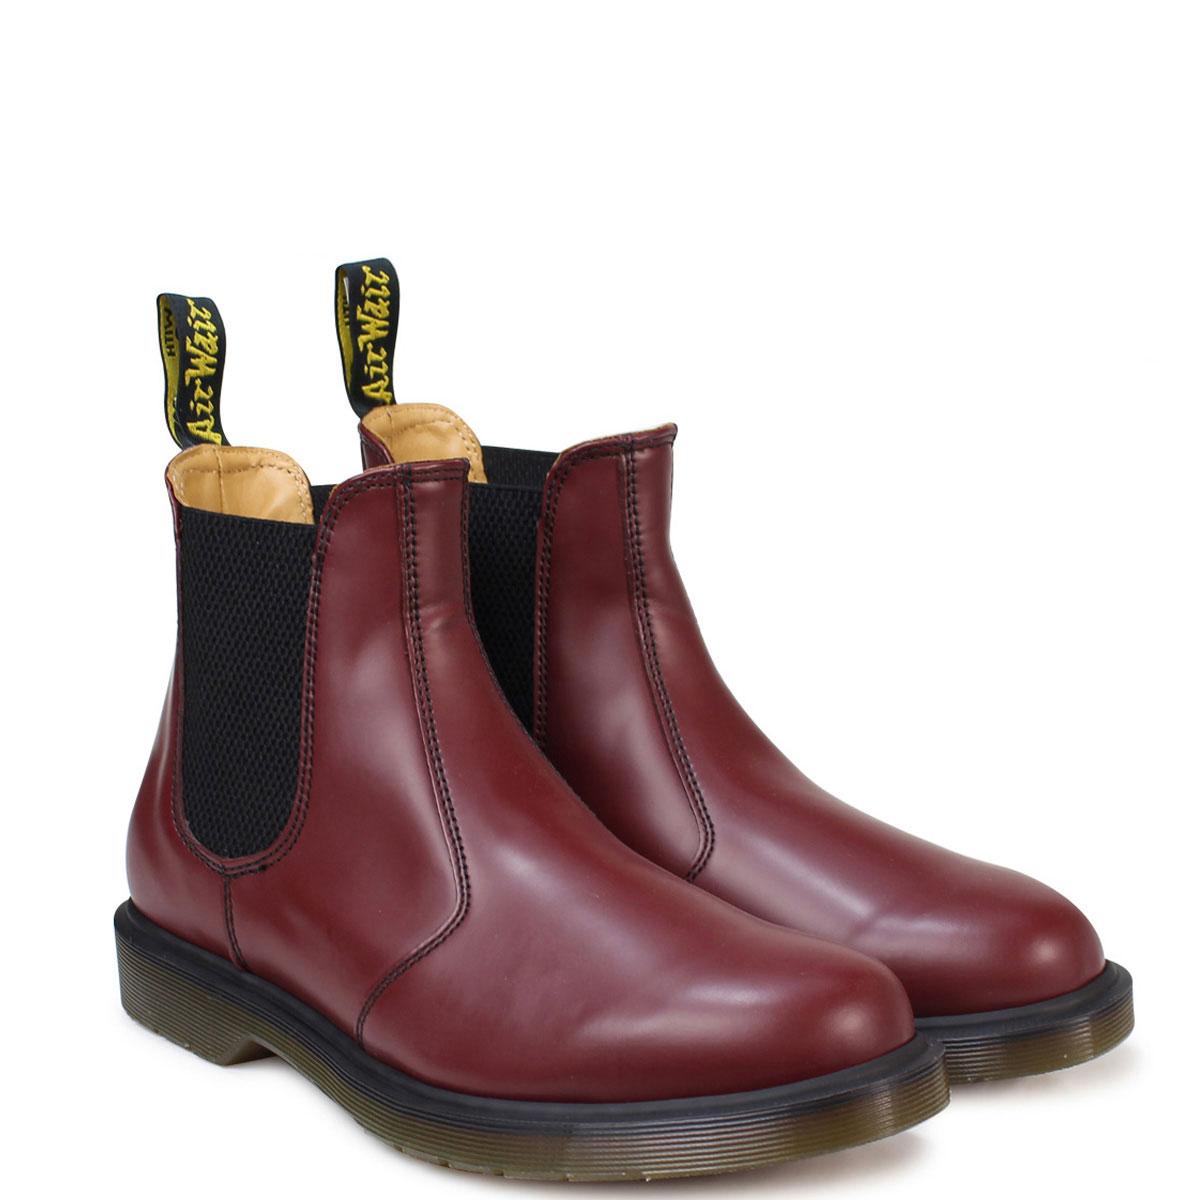 Dr.Martens CHELSEA BOOT R11853600 サイドゴア メンズ レディース ドクターマーチン 2976 チェルシー ブーツ